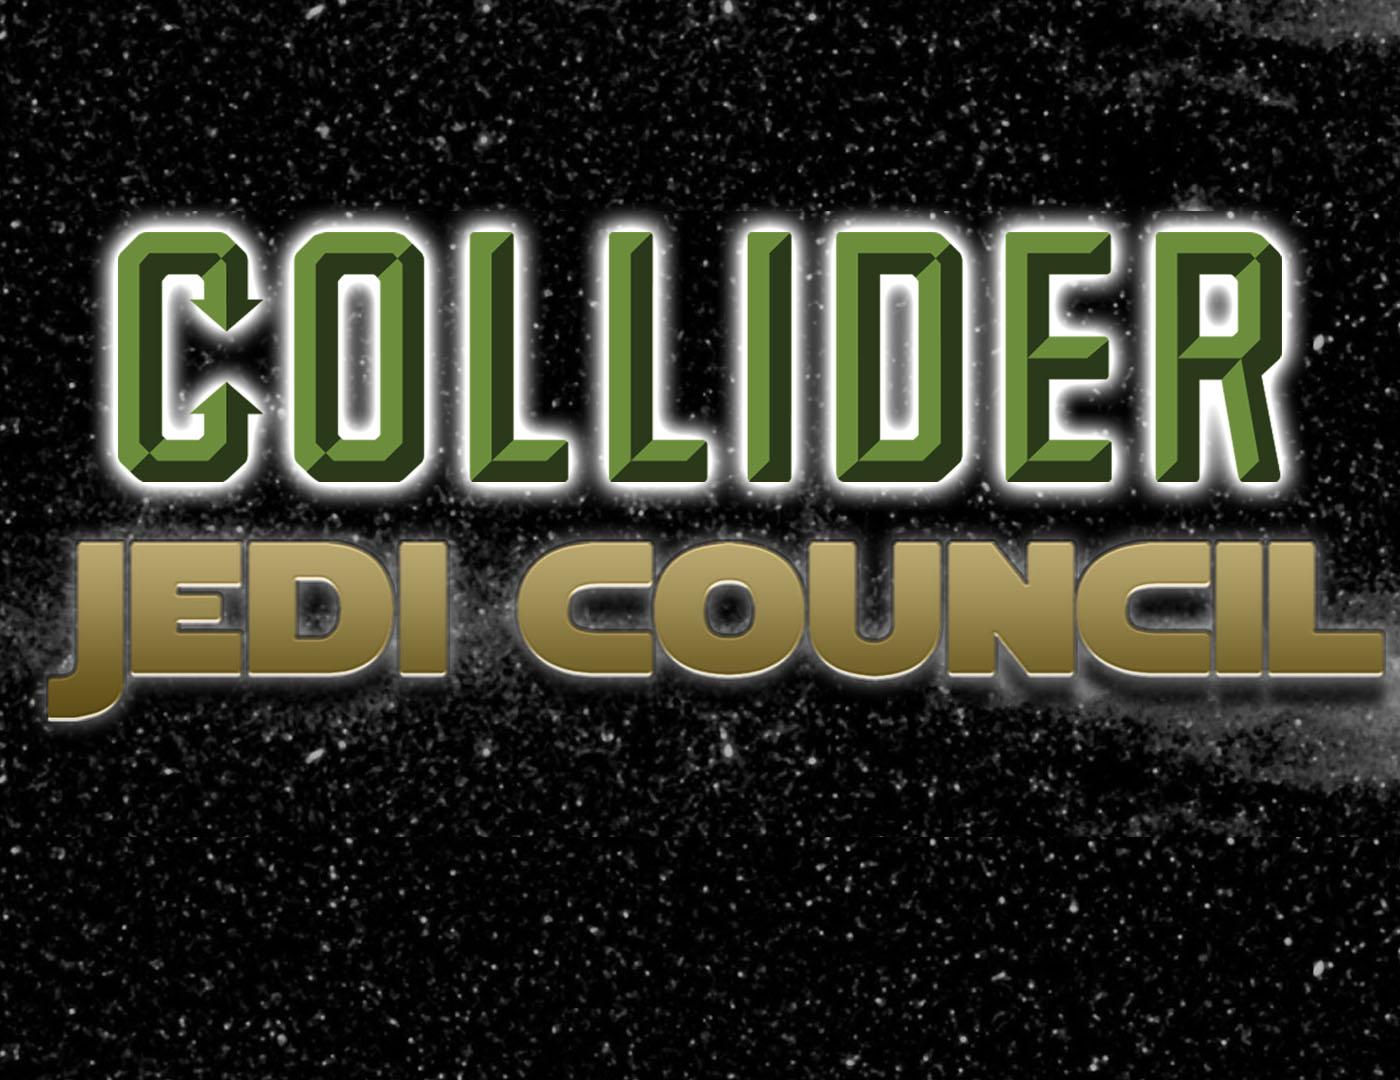 Han Solo or Obi Wan Trilogy Movies A Better Idea? - Collider Jedi Council